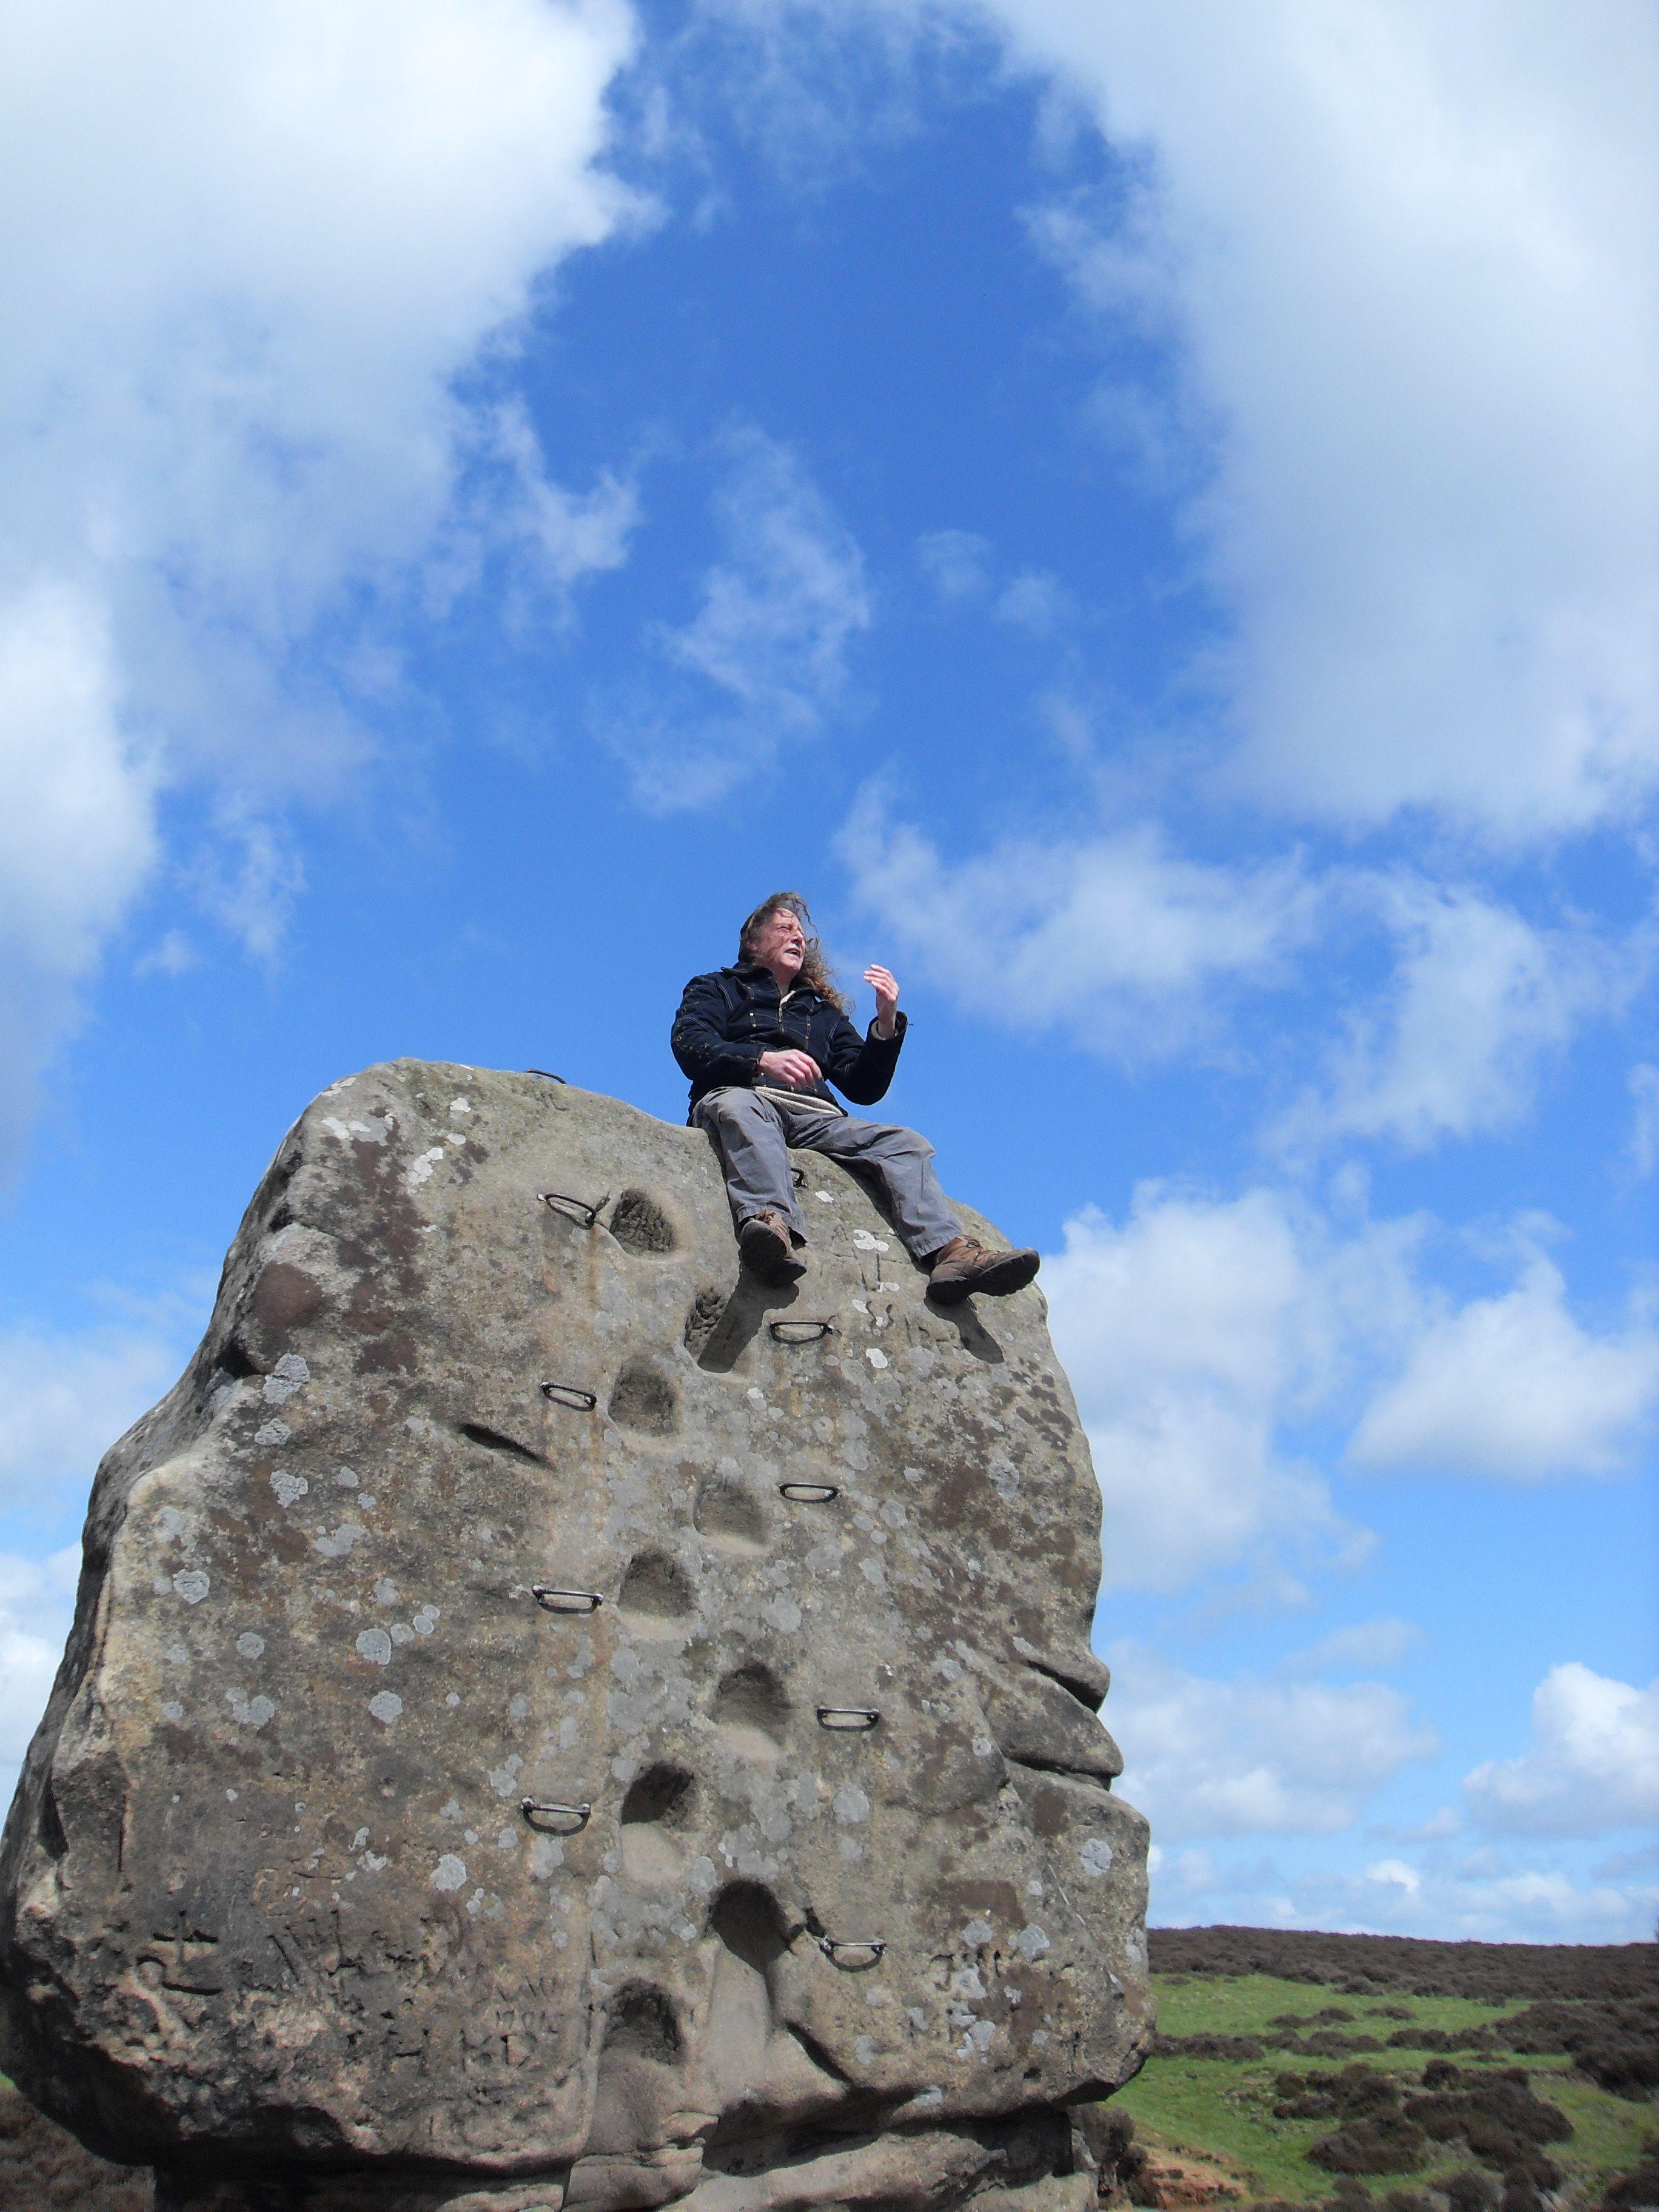 The Cork Stone, Stanton Moor near Matlock Derbyshire